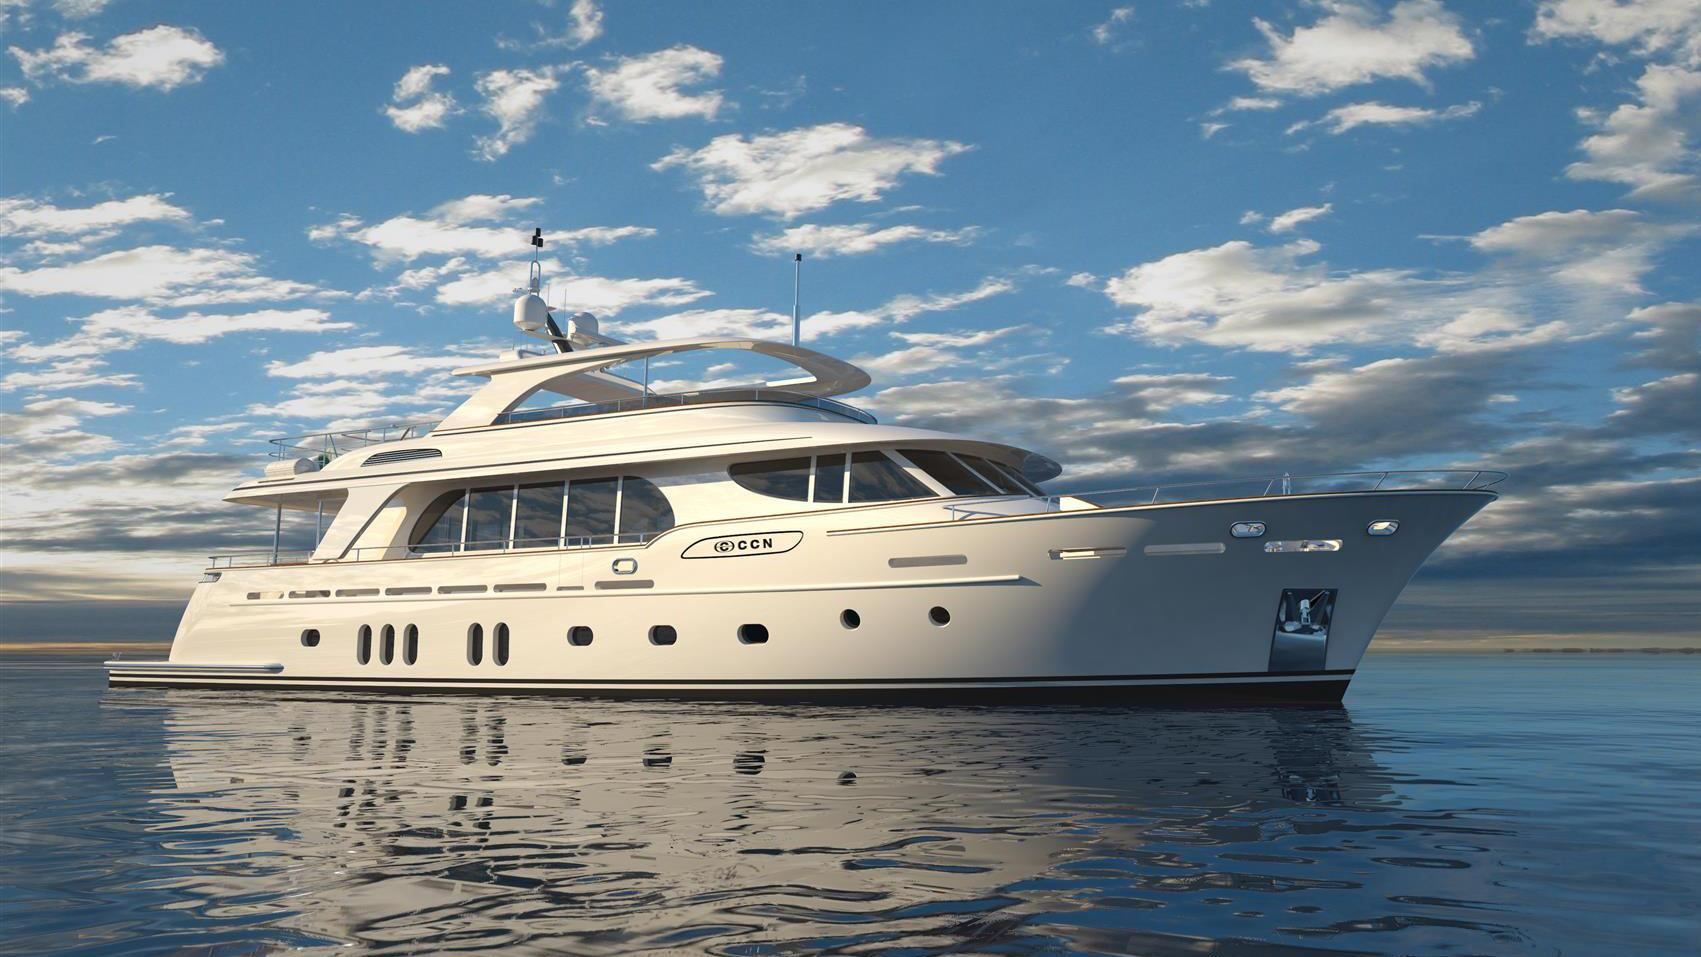 fuoriserie 31m motoryacht ccn 31m 2019 profile